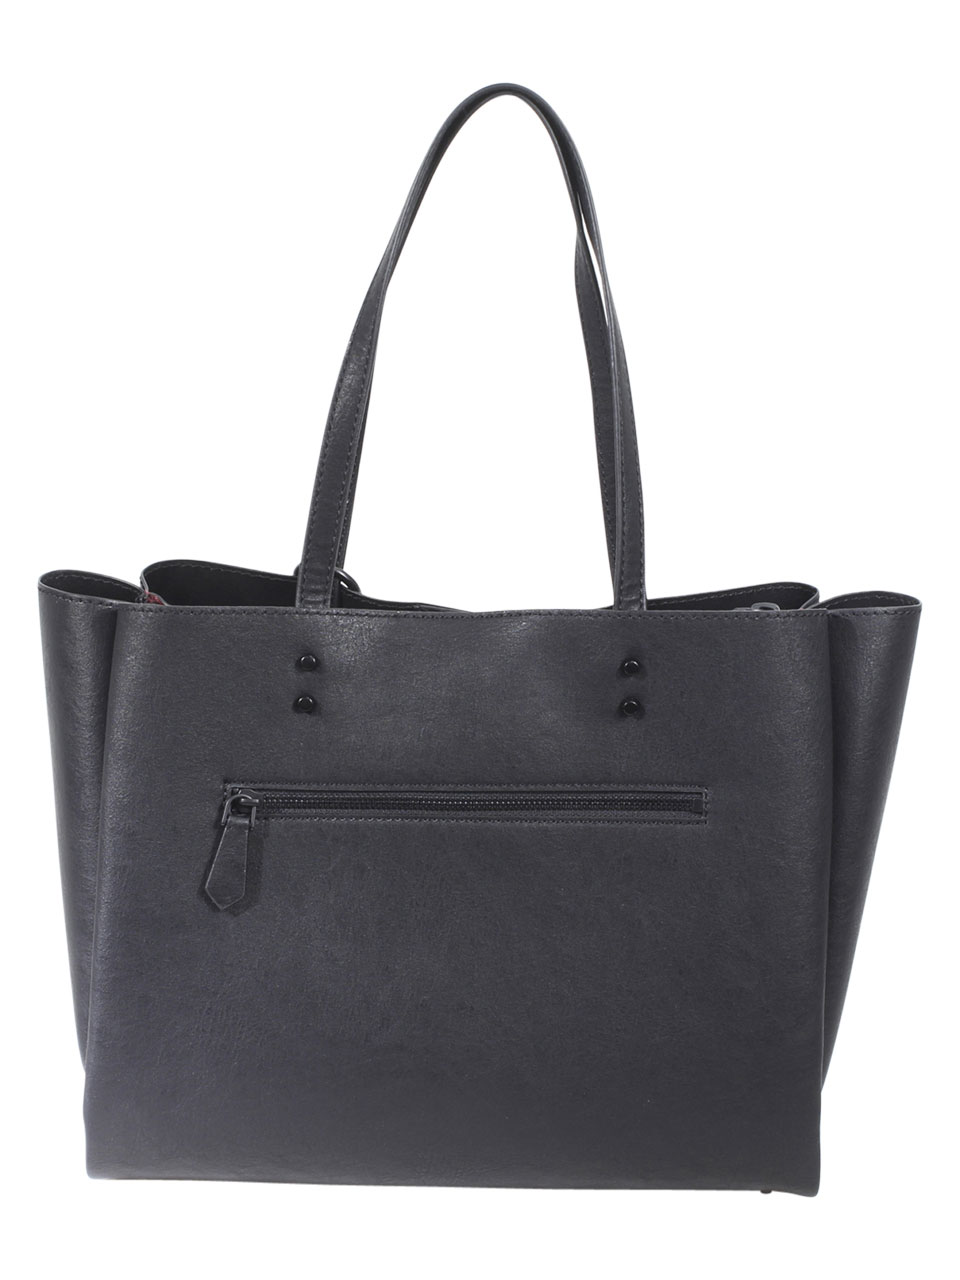 9834c2a567 Guess Femmes Jade Petite Amie Carry All Sac à Main | eBay